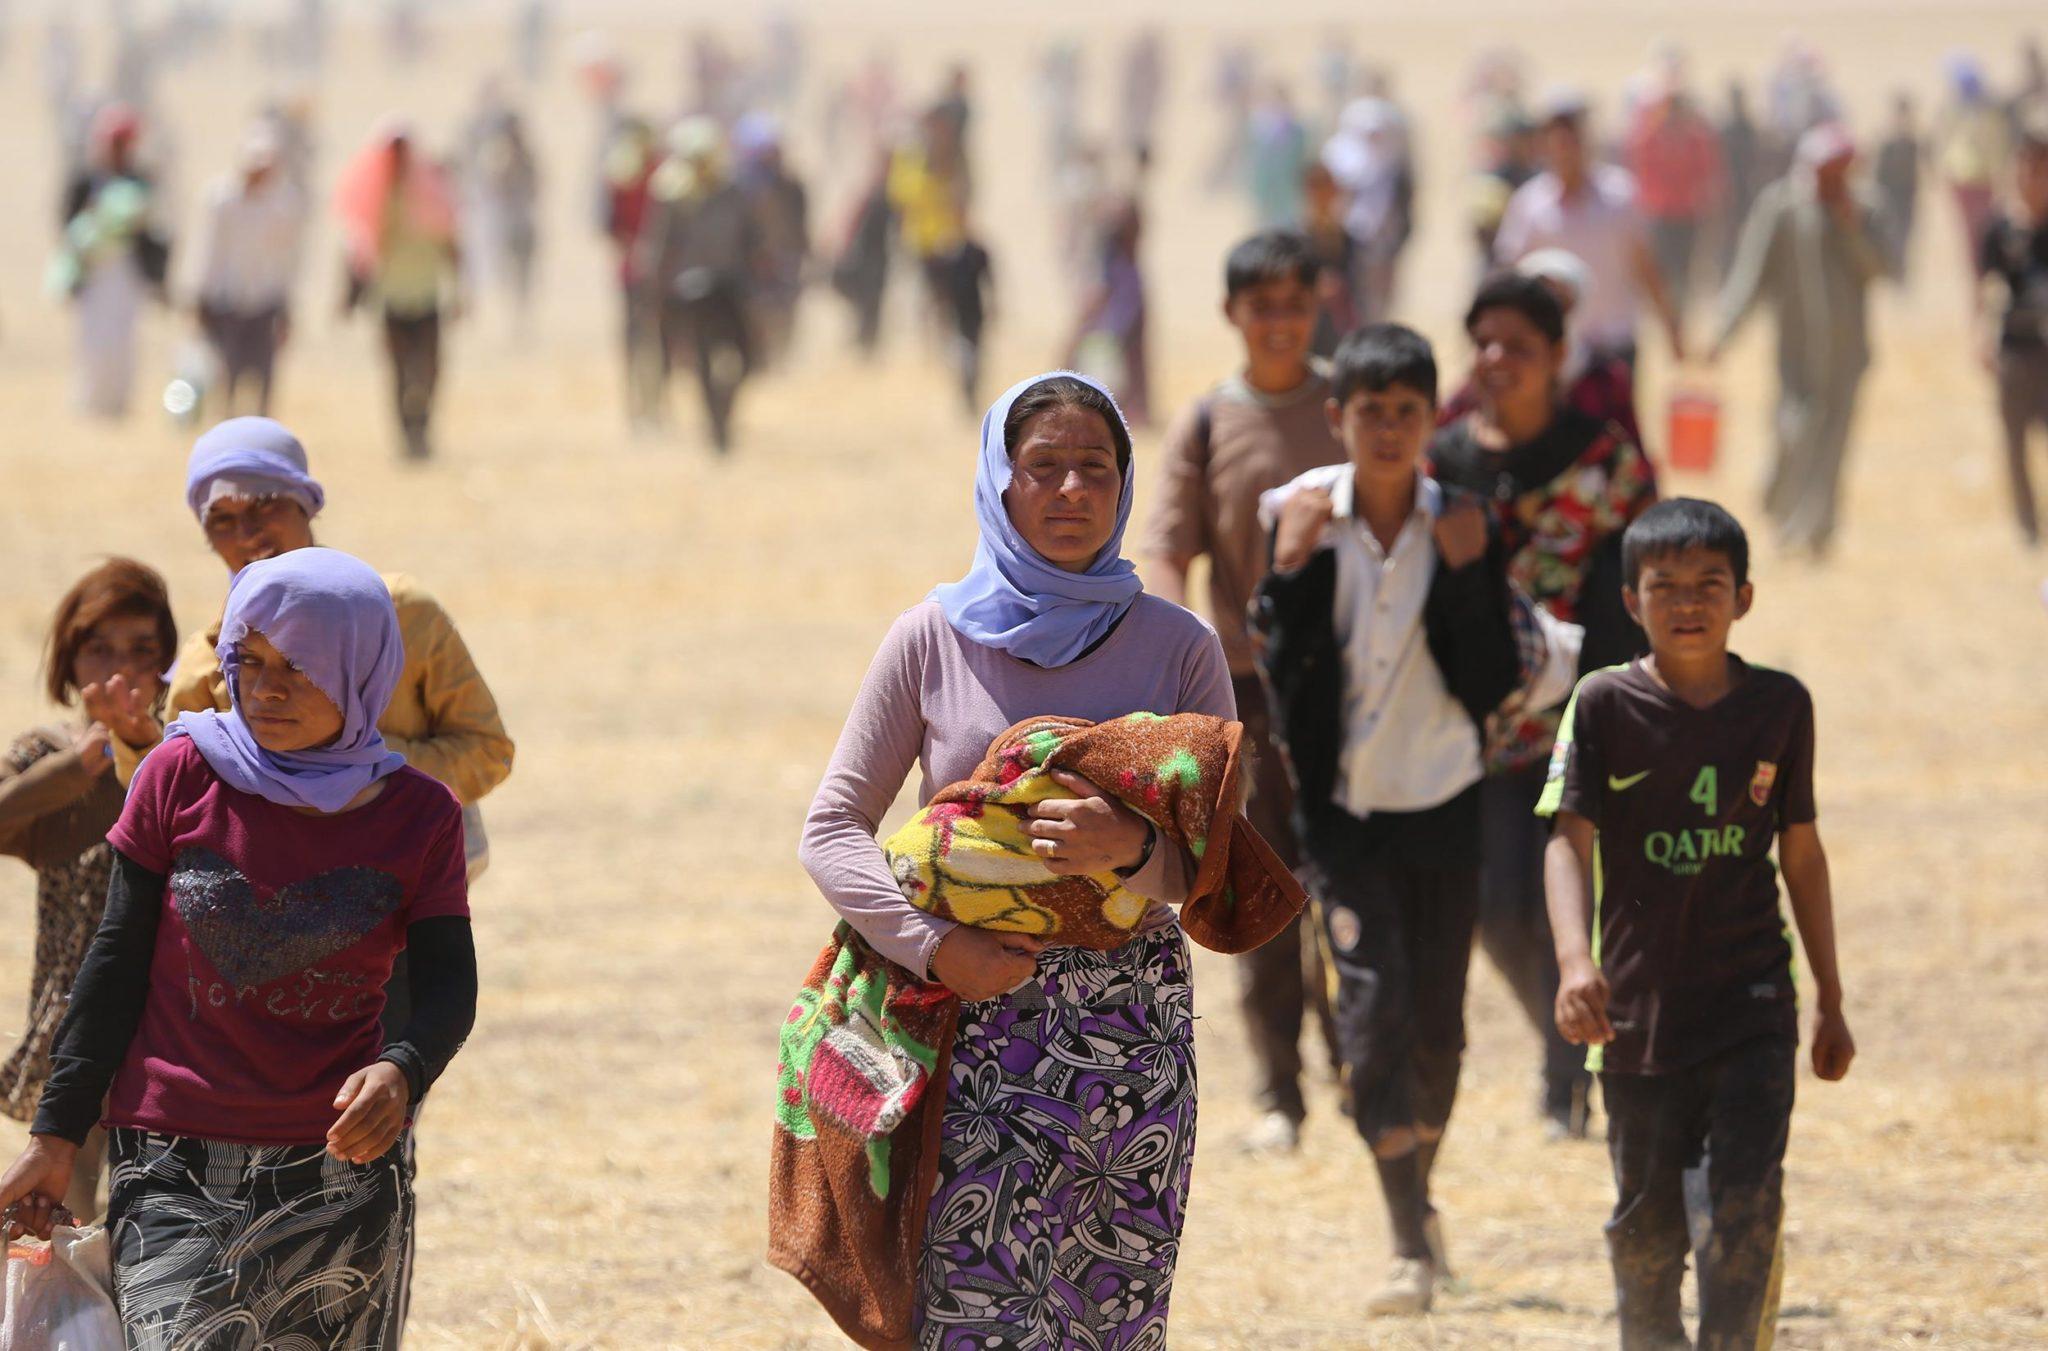 Yezidis flee from Daesh Aug 3rd 2014